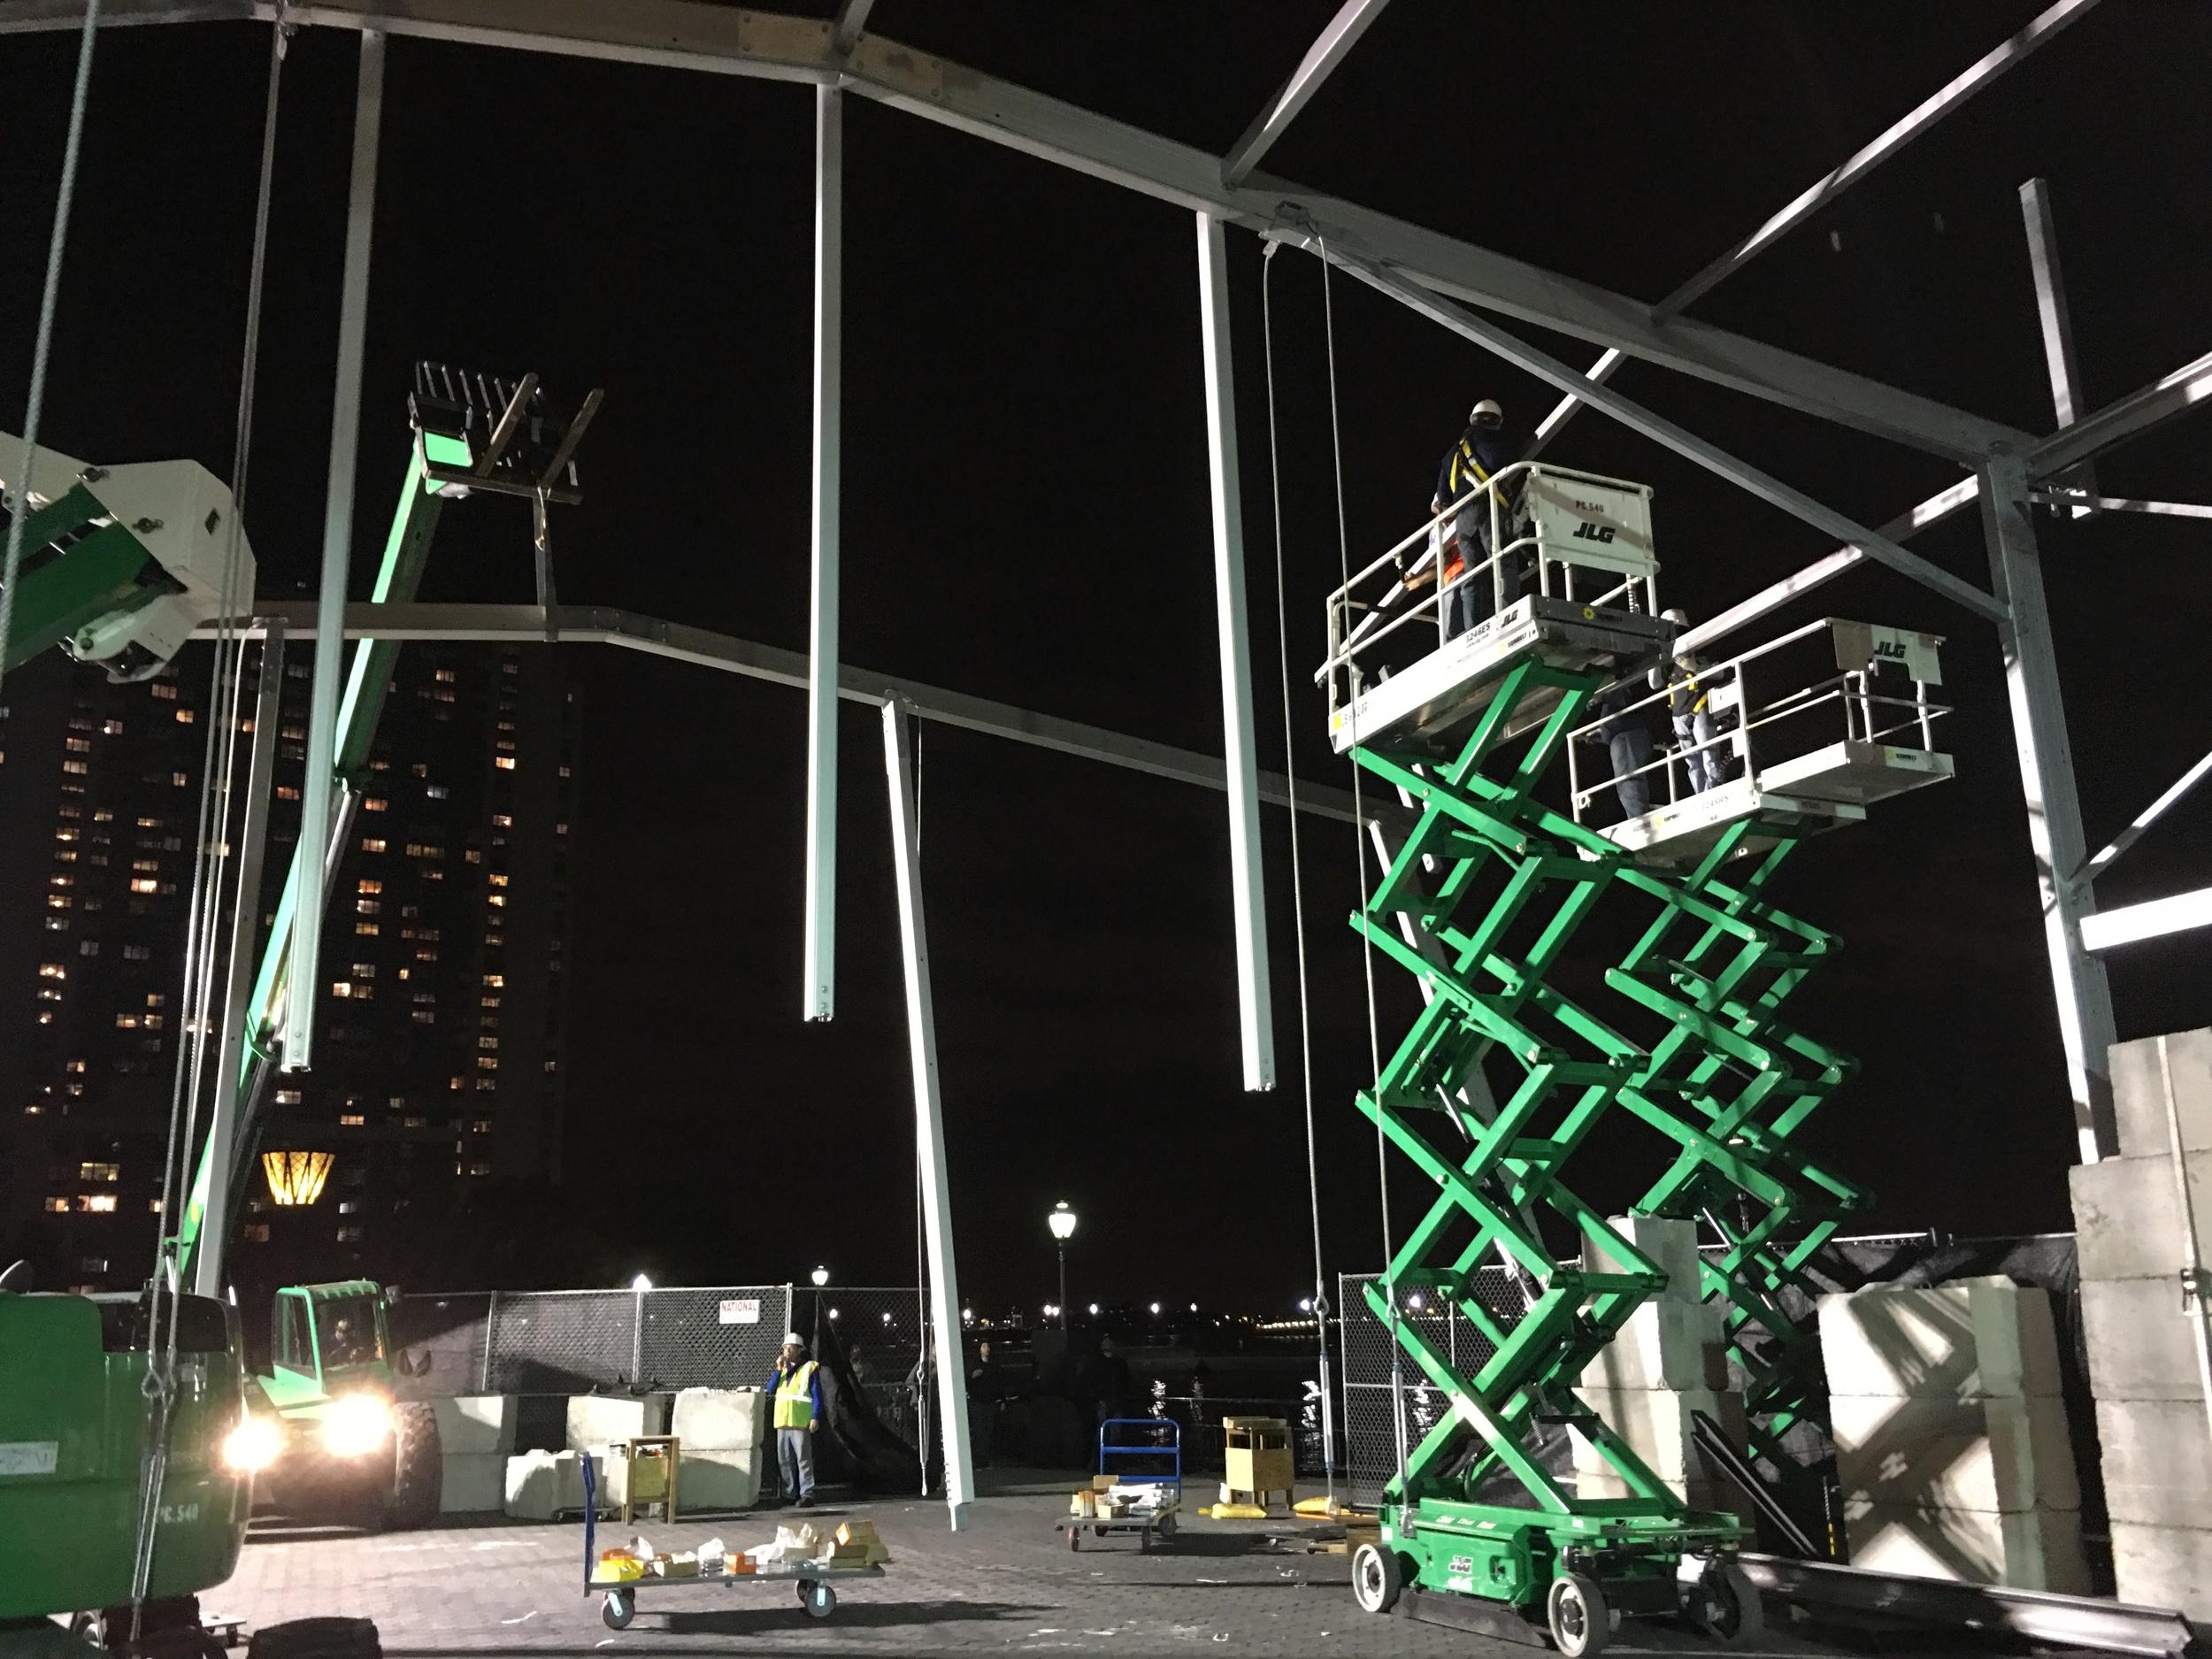 Working after dark to complete installation